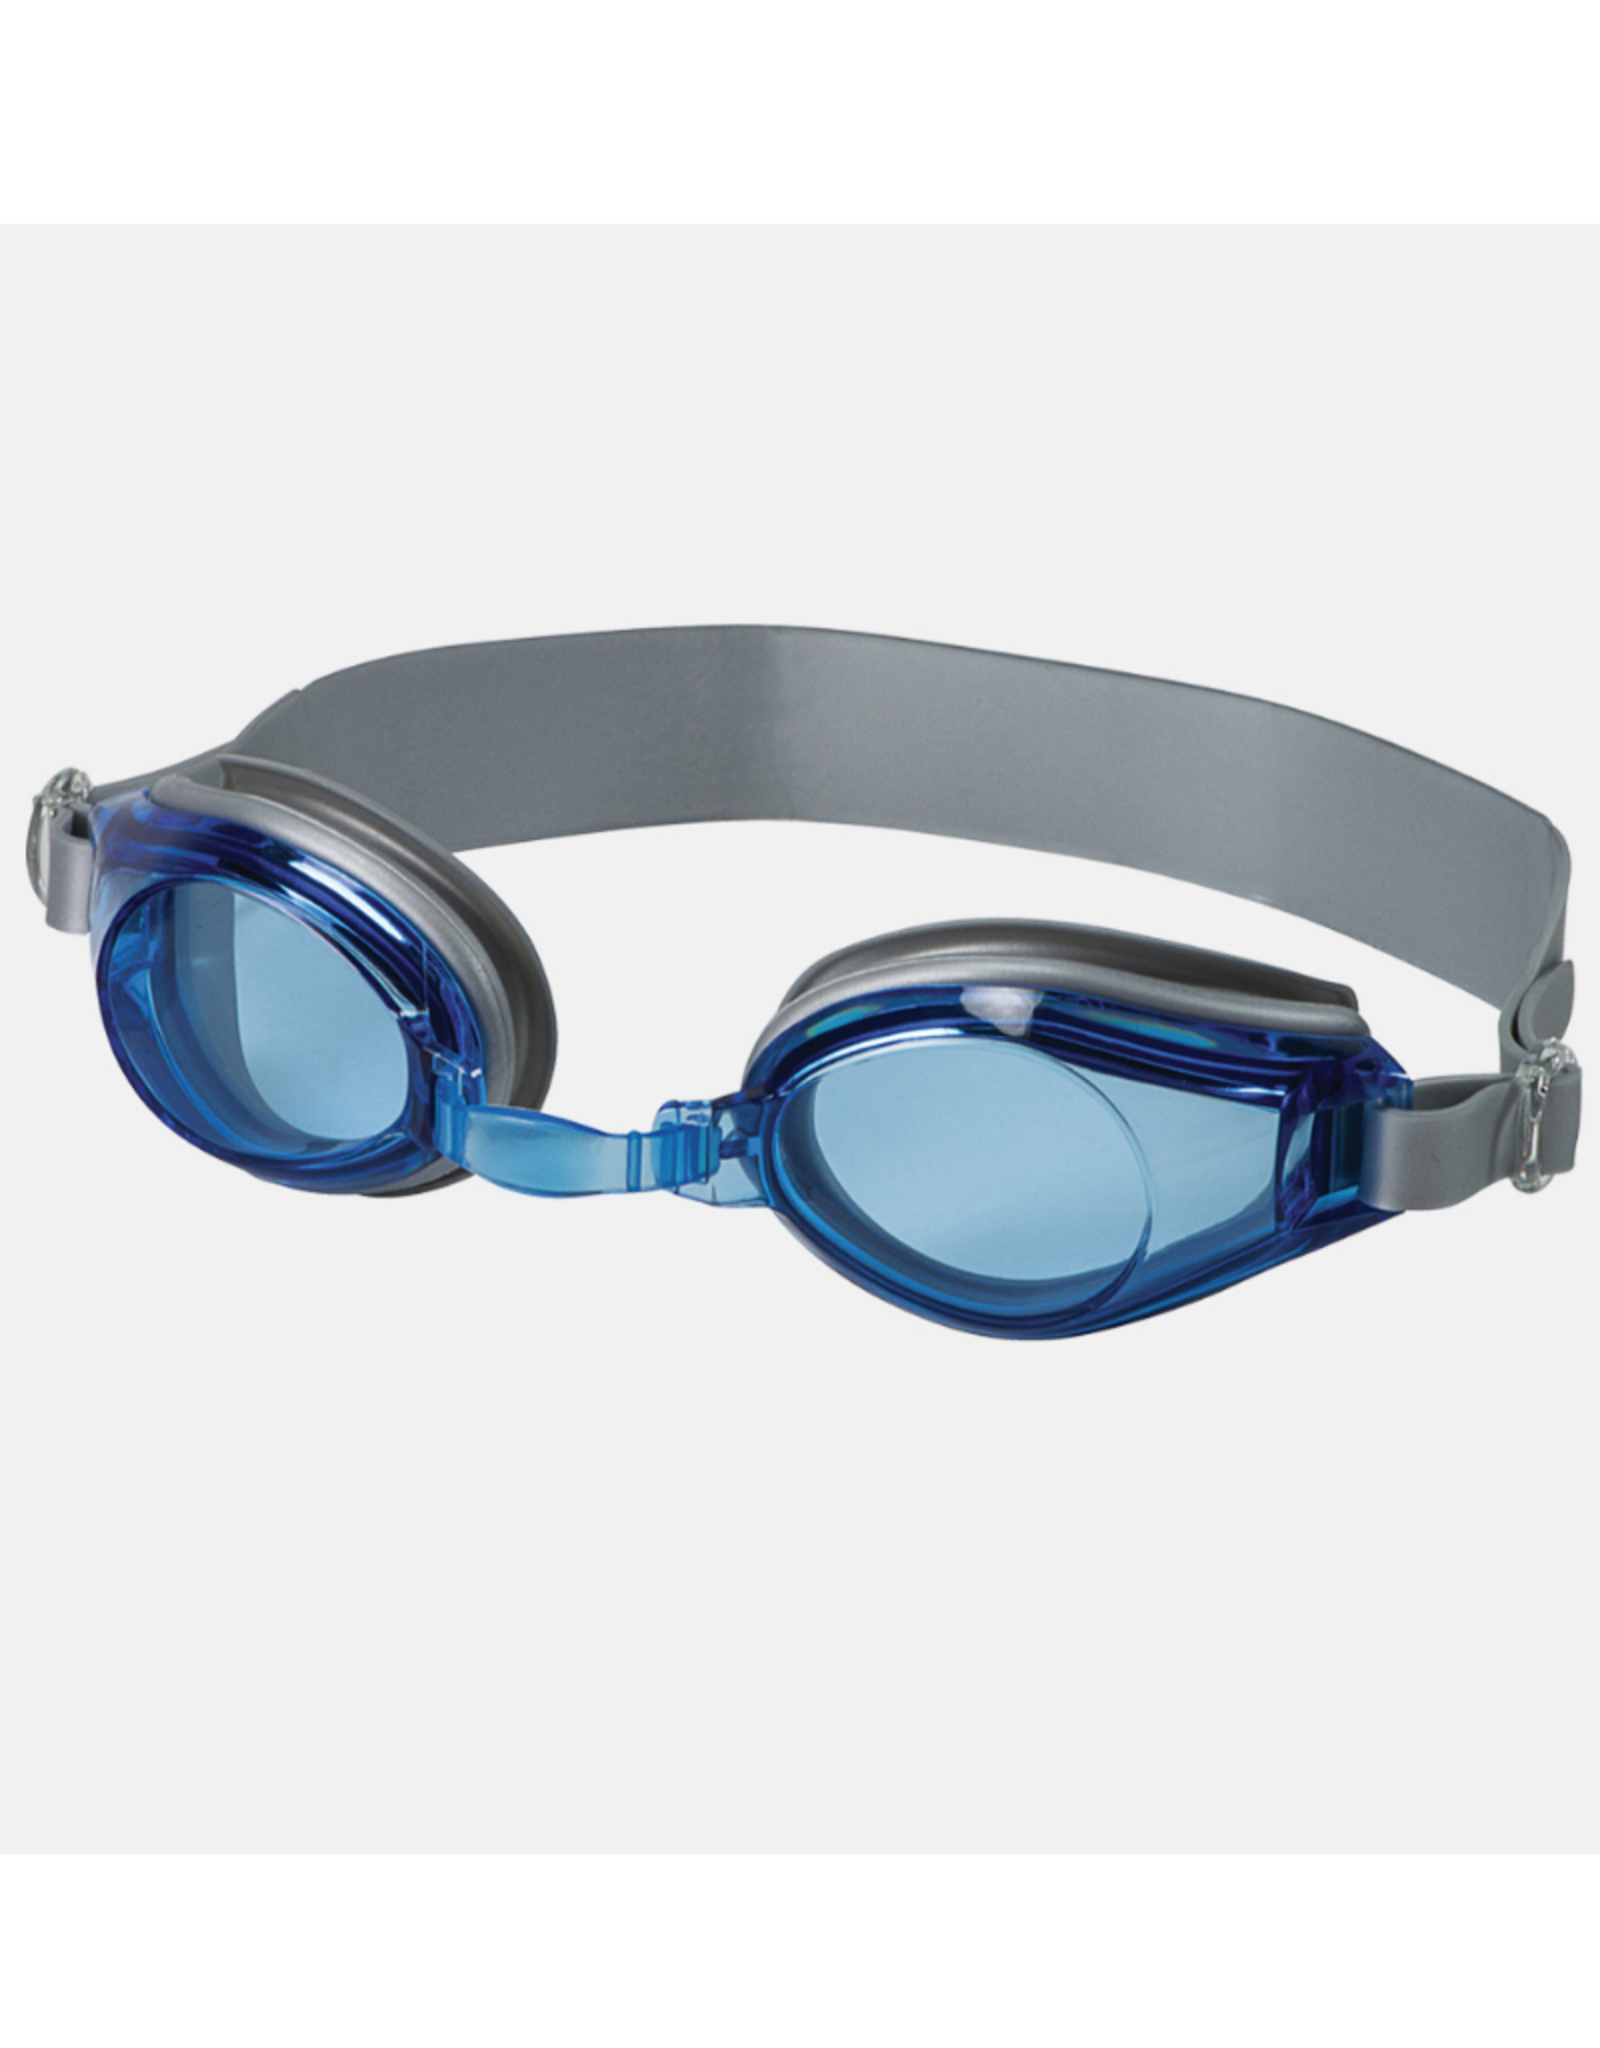 Leader Adult Castaway Swim Goggles Blue/Silver